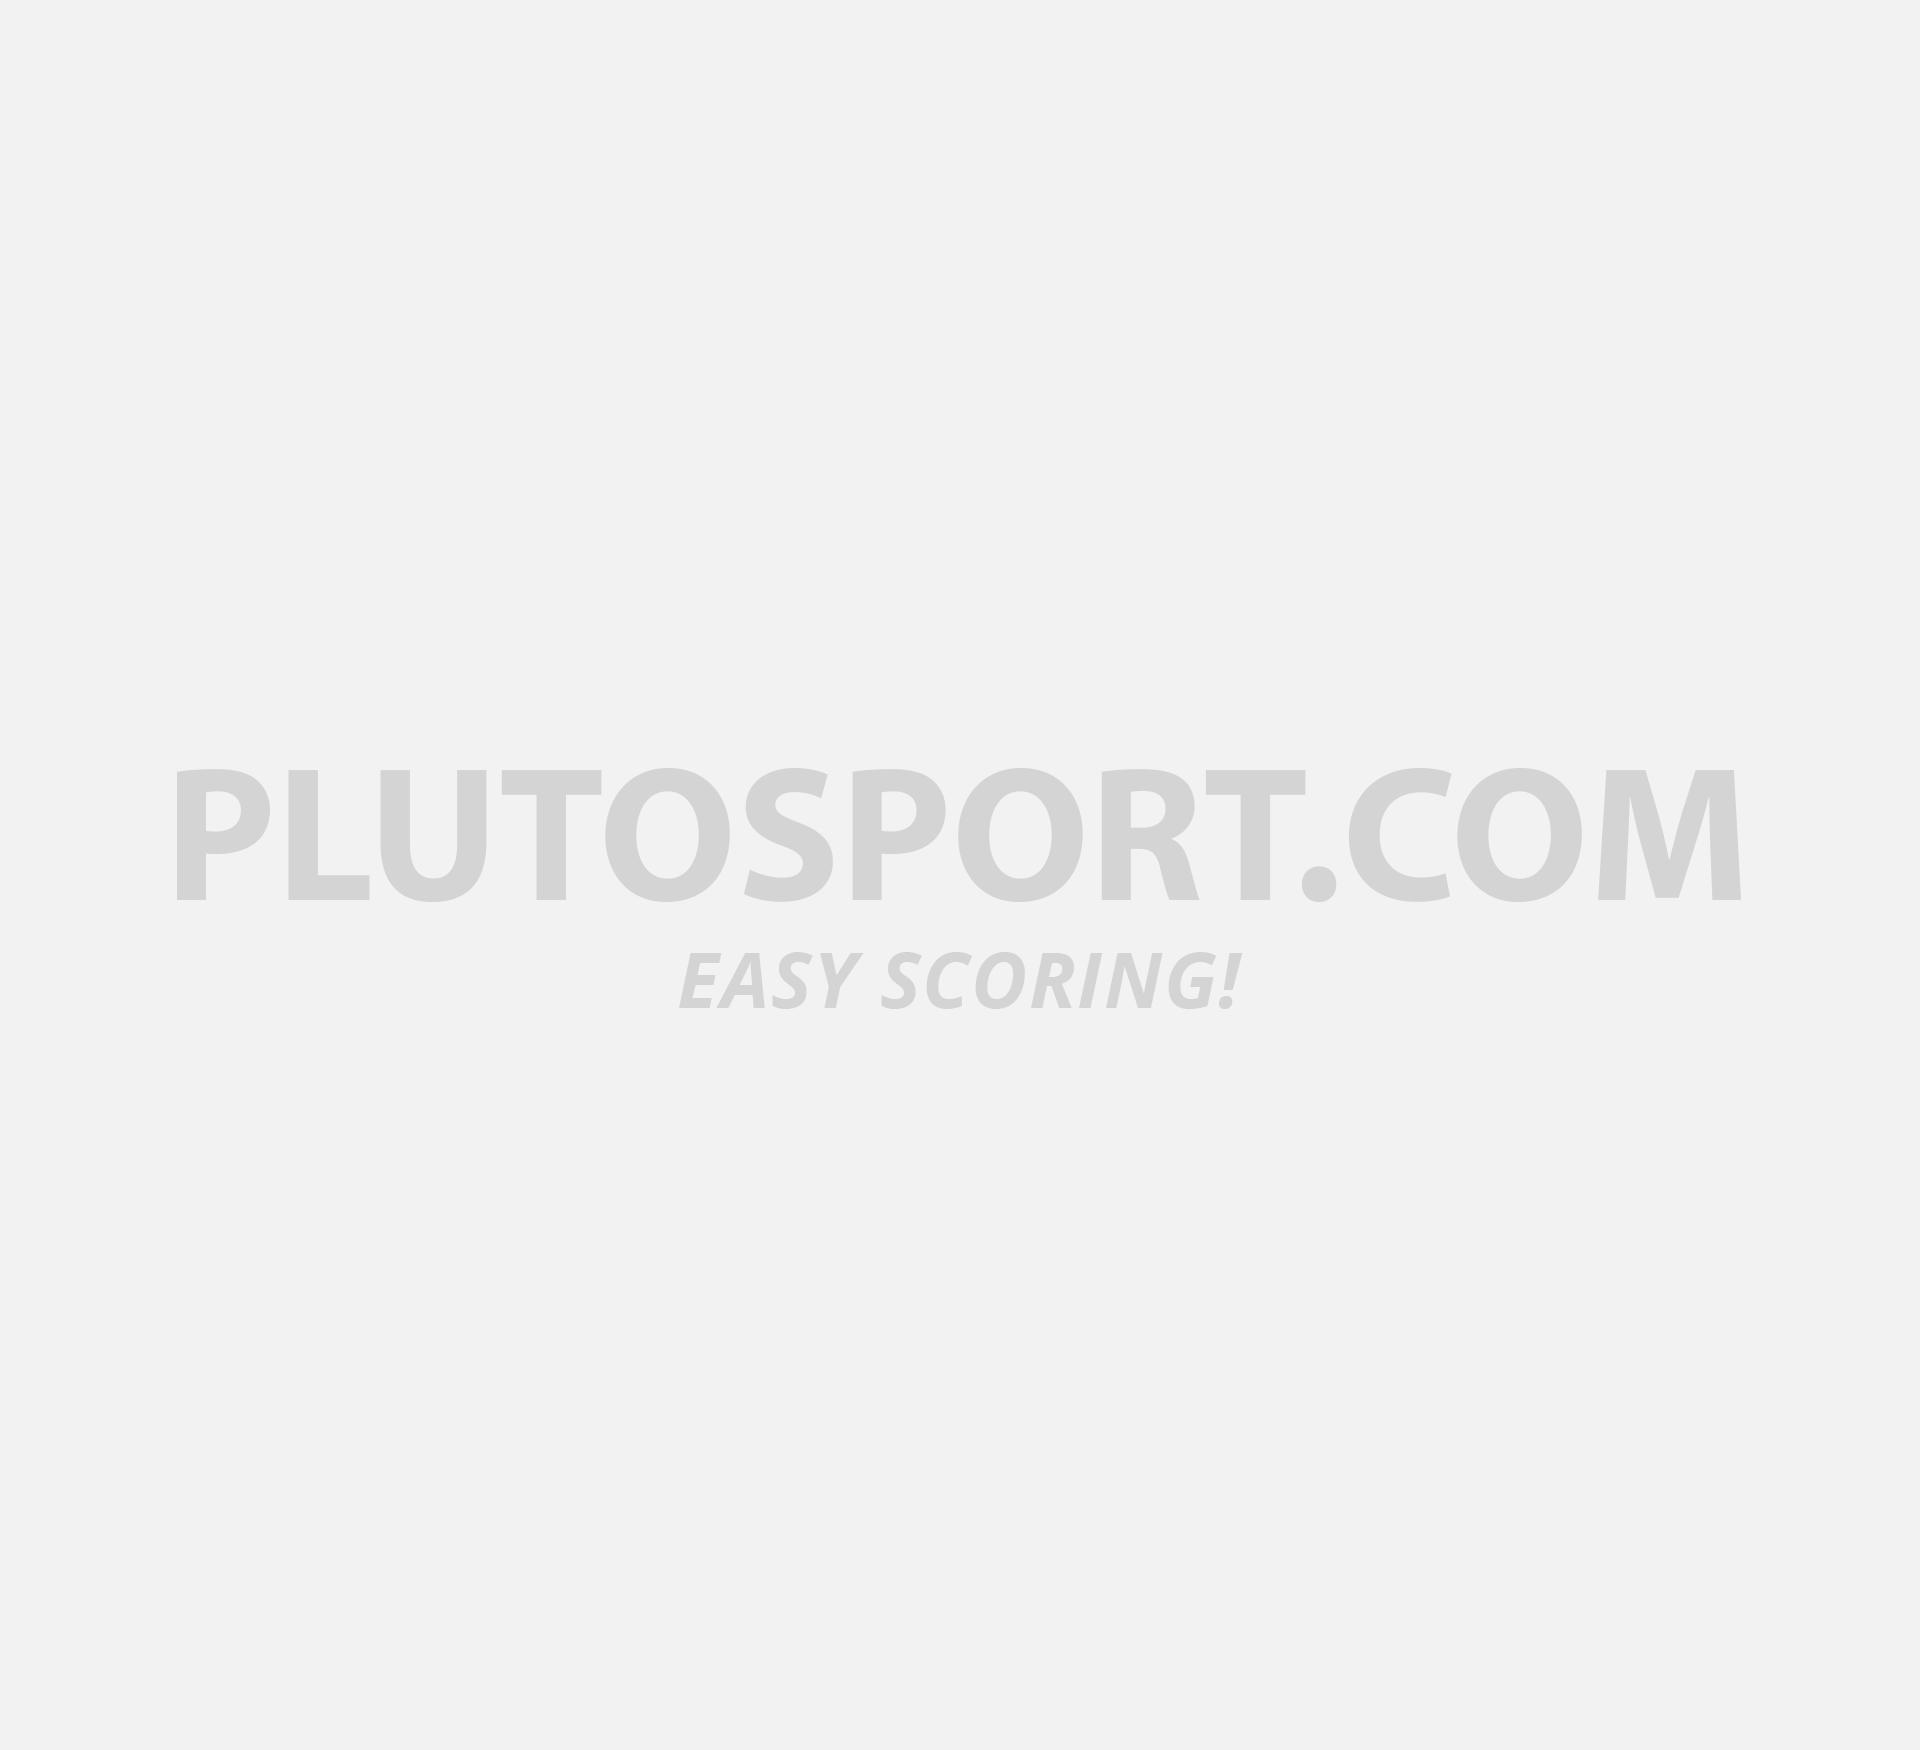 Adidas Training Bib 14 - Bibs - Accessories - Football - Women ... 65dfcab1e2